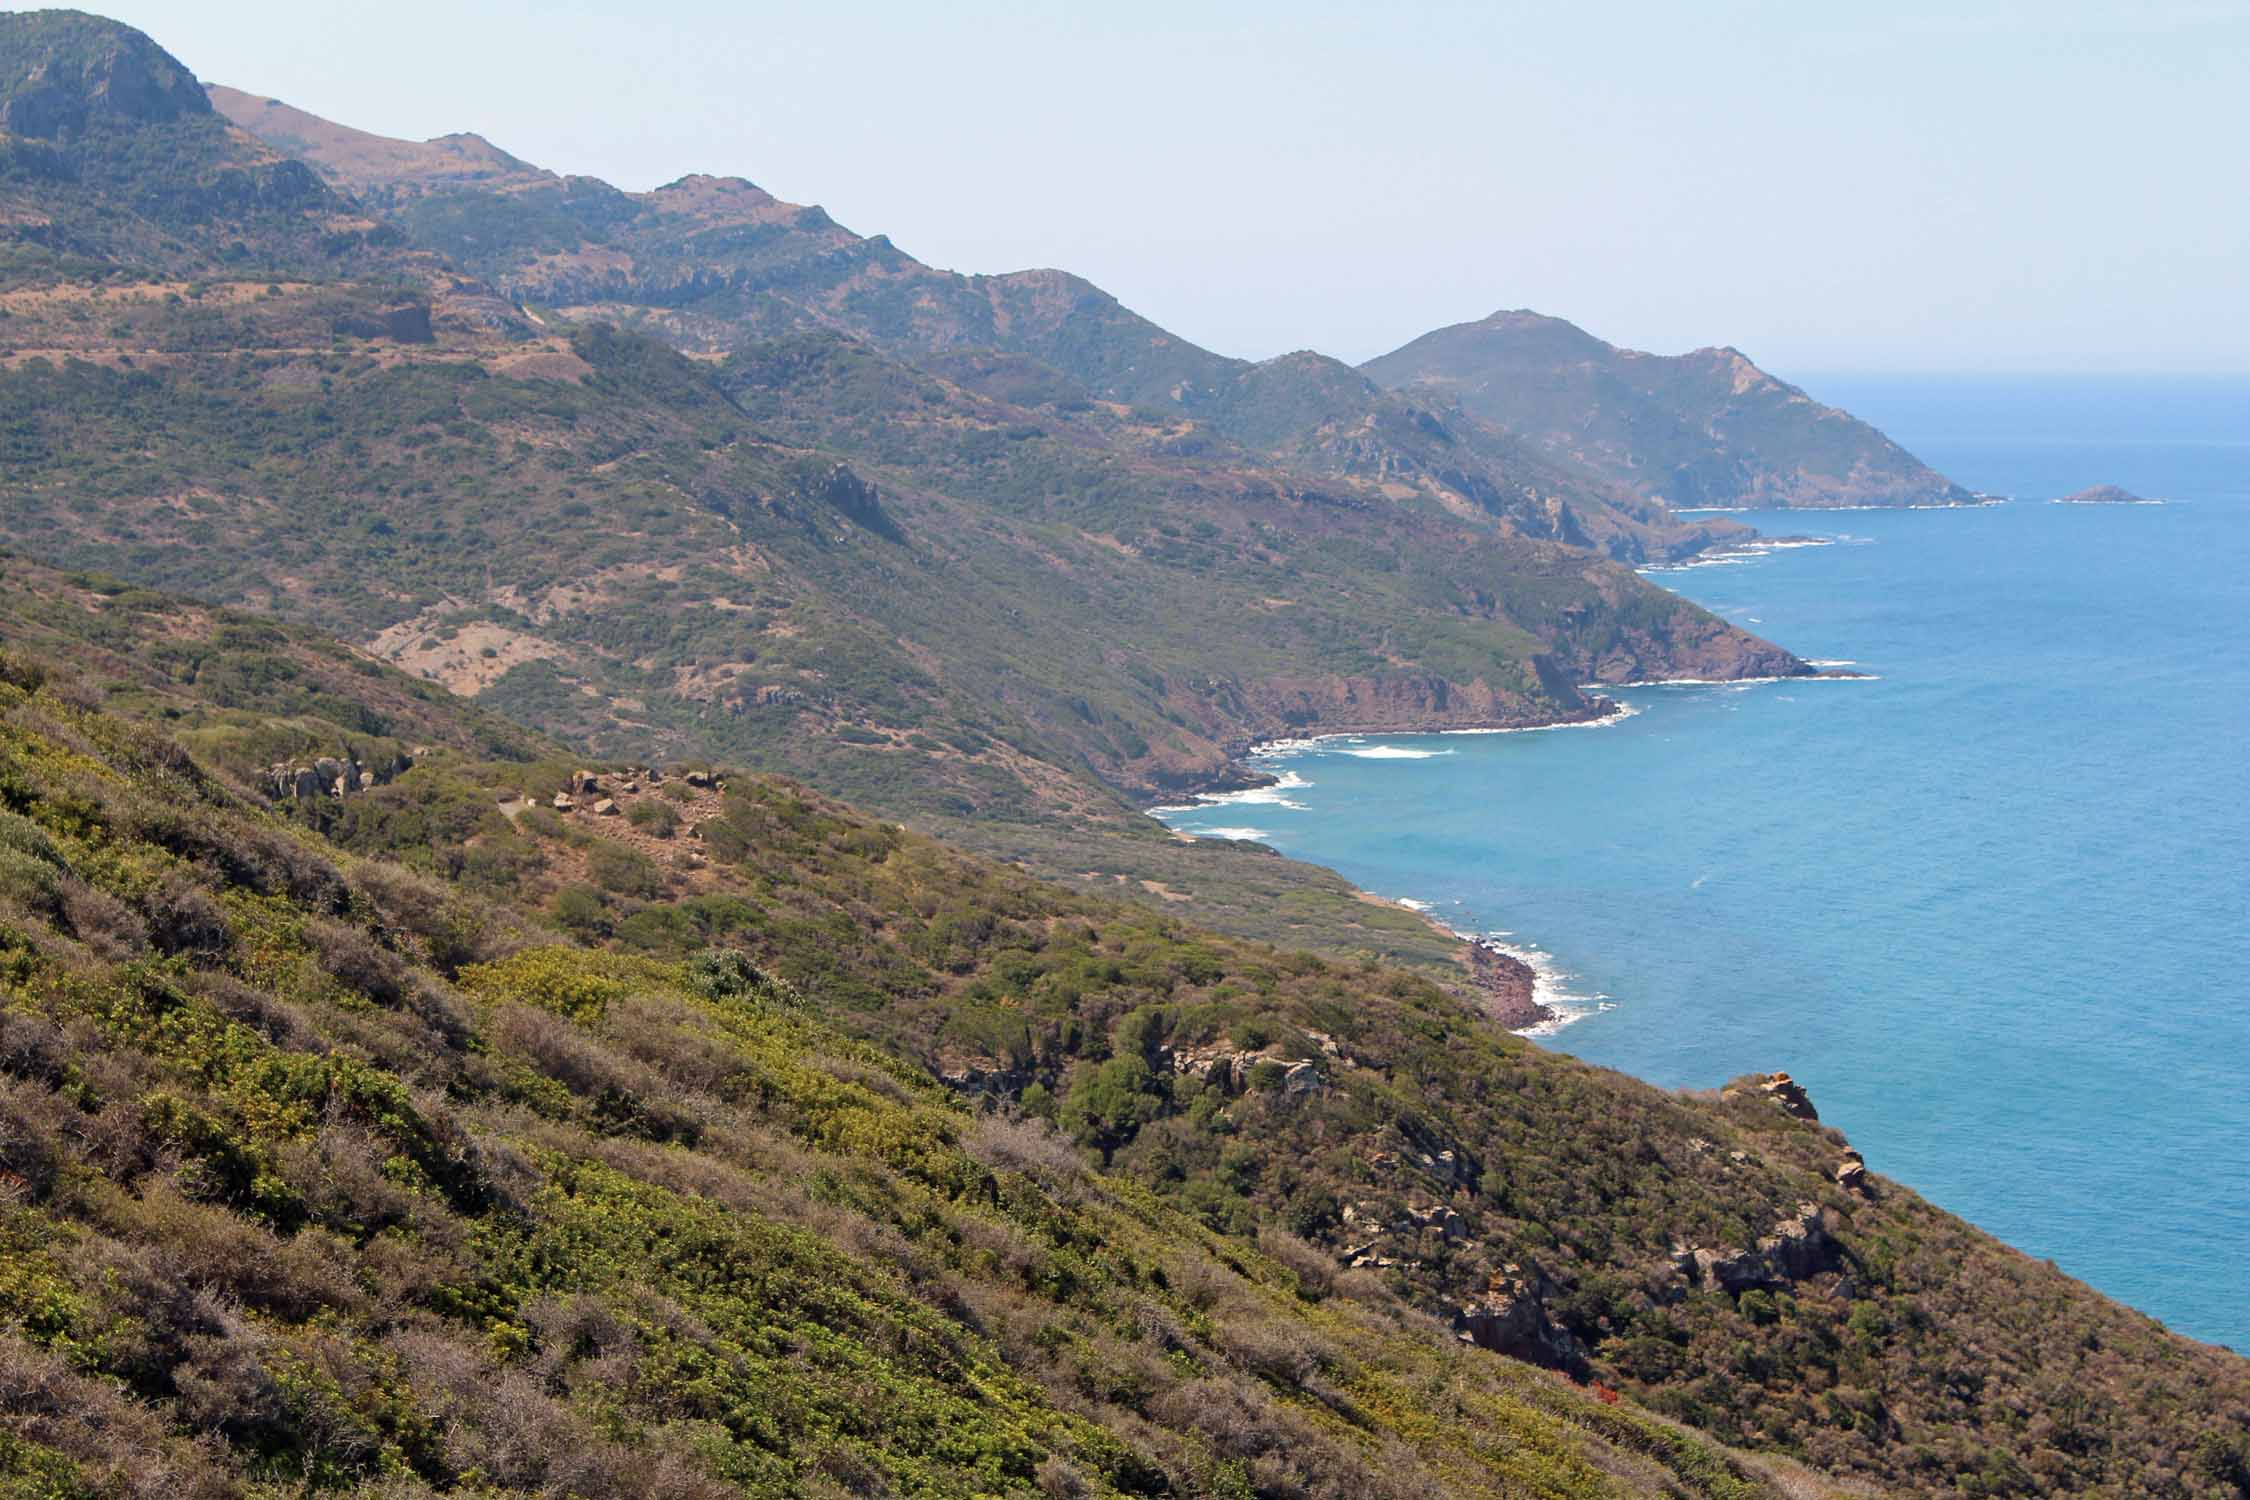 Route Alghero - Bosa